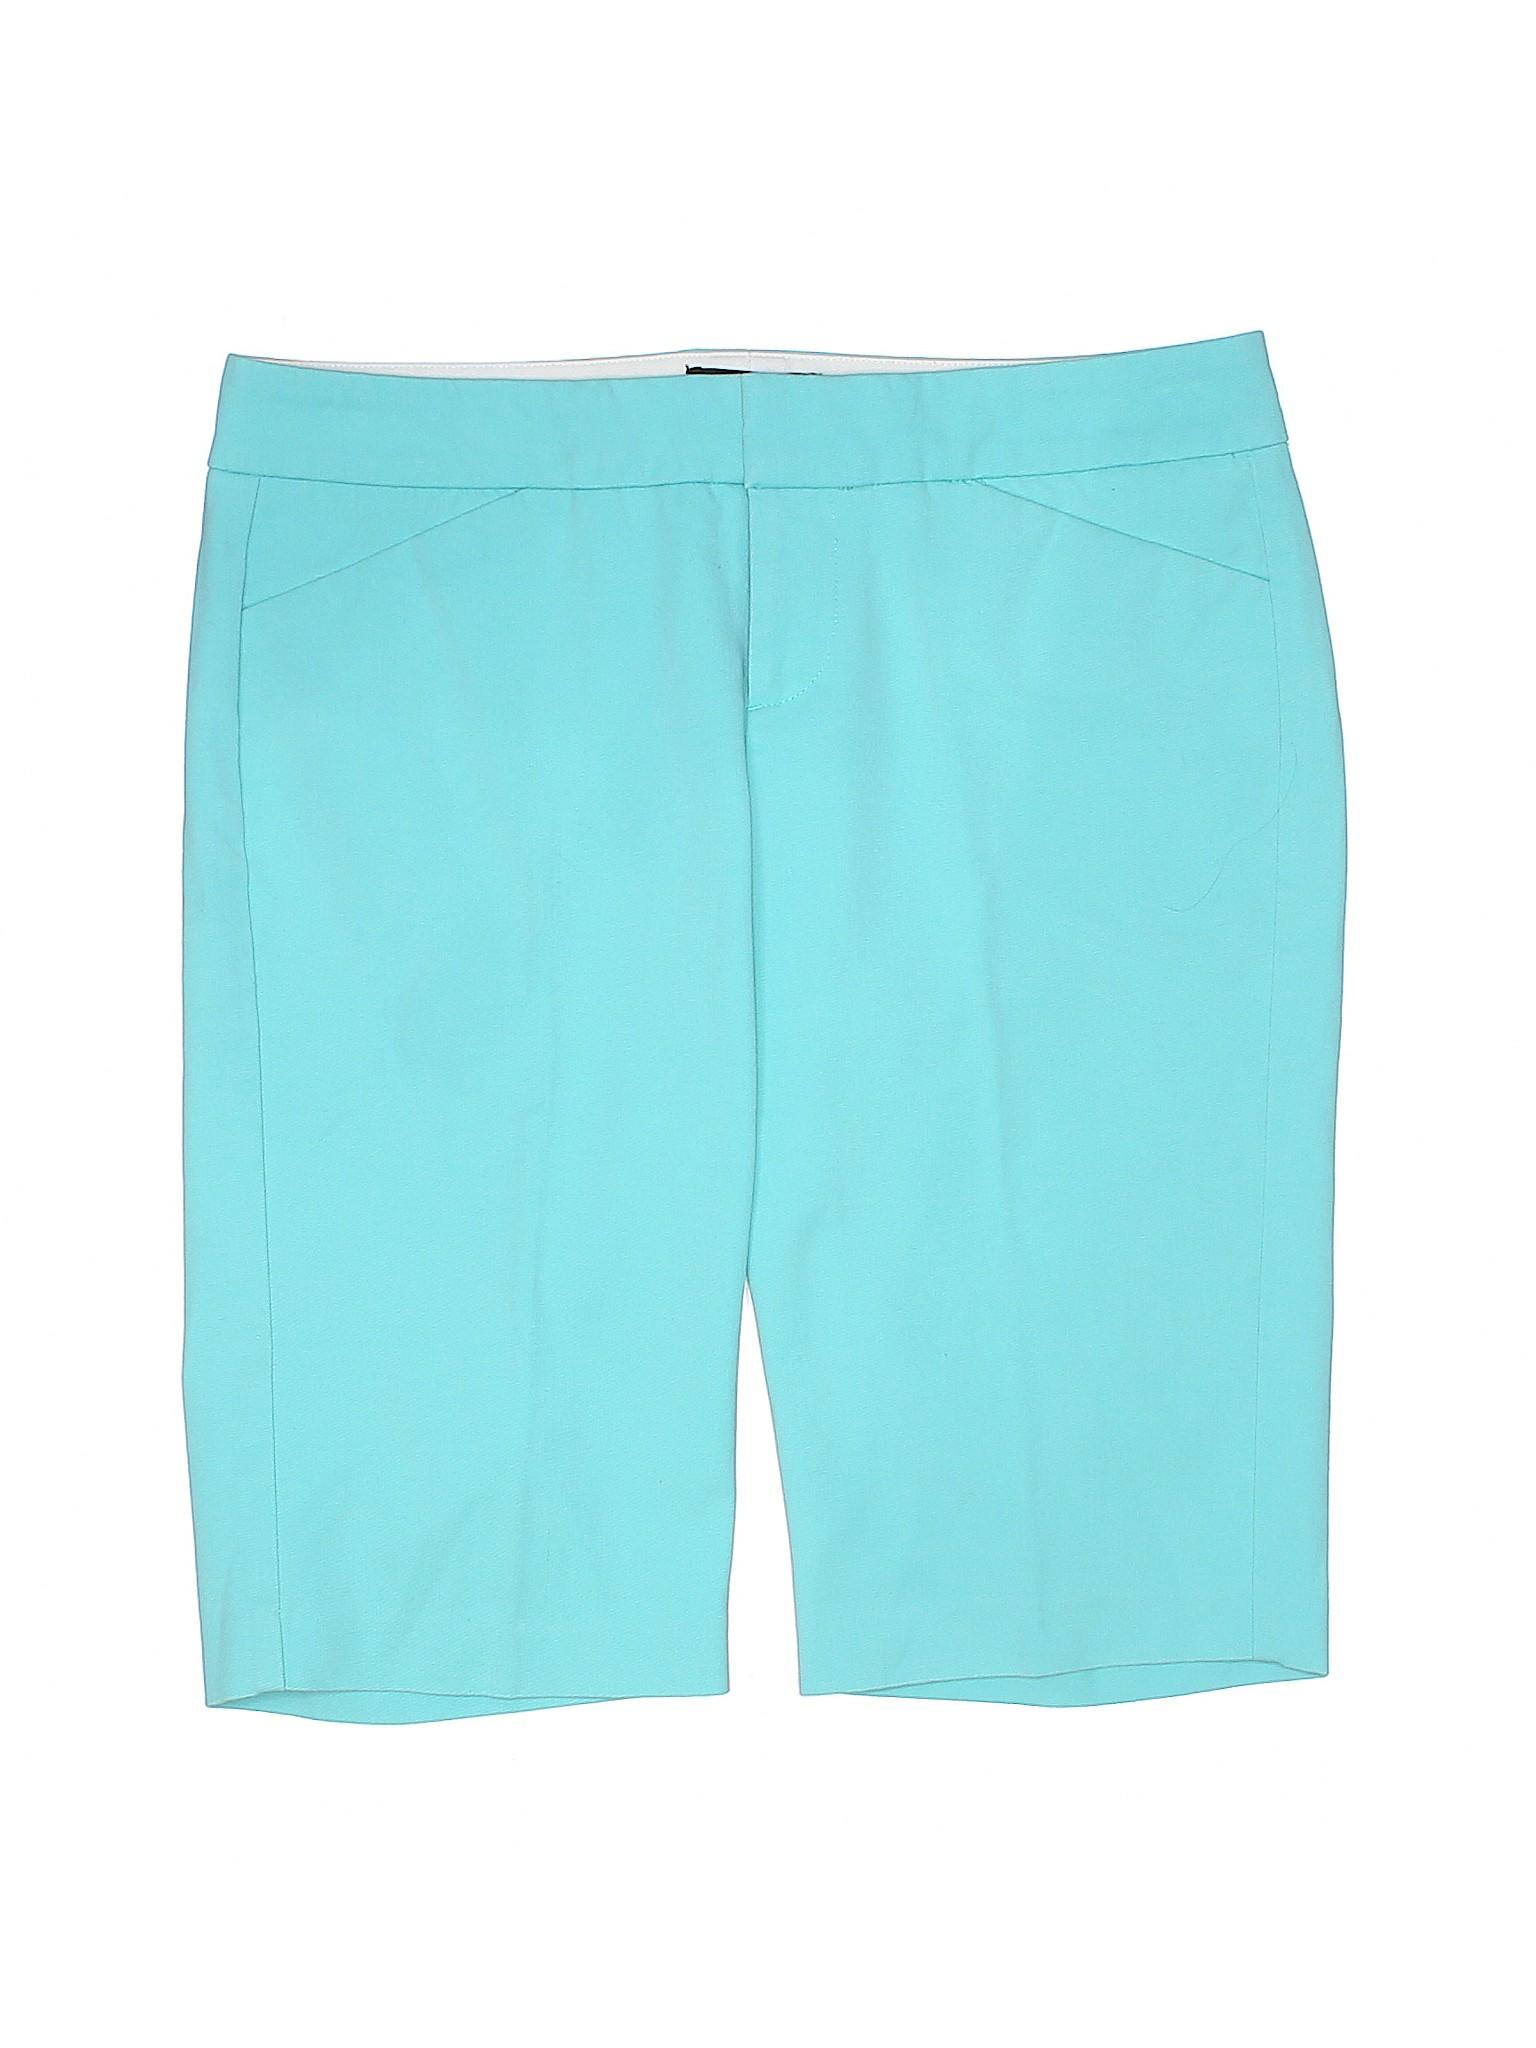 Cynthia Rowley for Boutique J T Maxx Shorts Dressy Fxwd8qC5d